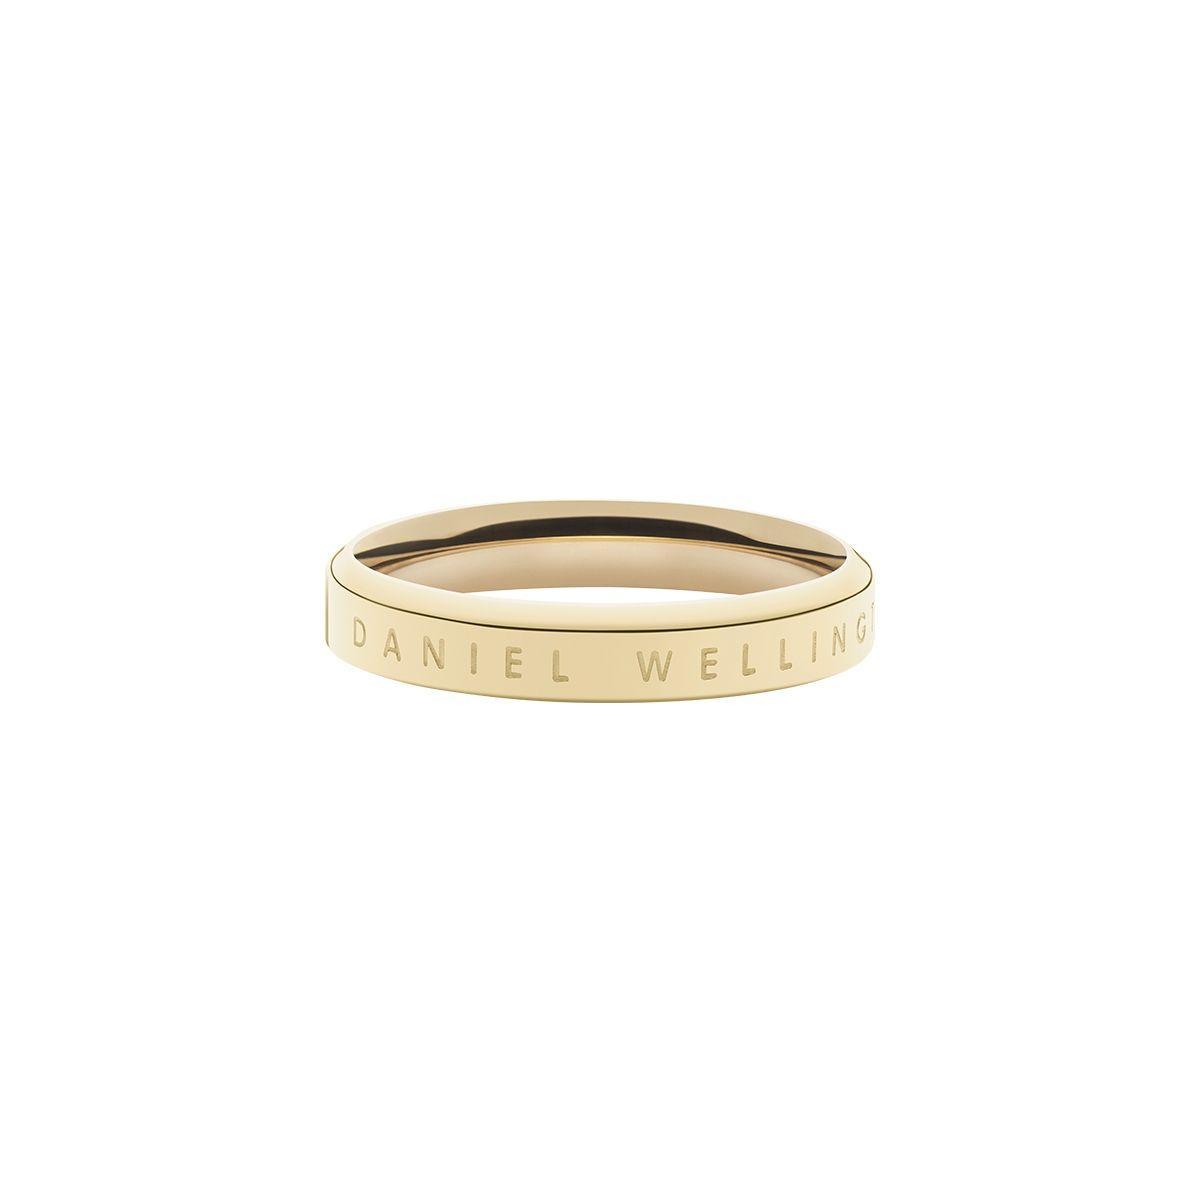 dw官网 dw手表官网 dw中国官网 dw官方旗舰店 DW DW官网  Classic Ring Gold 60 mm